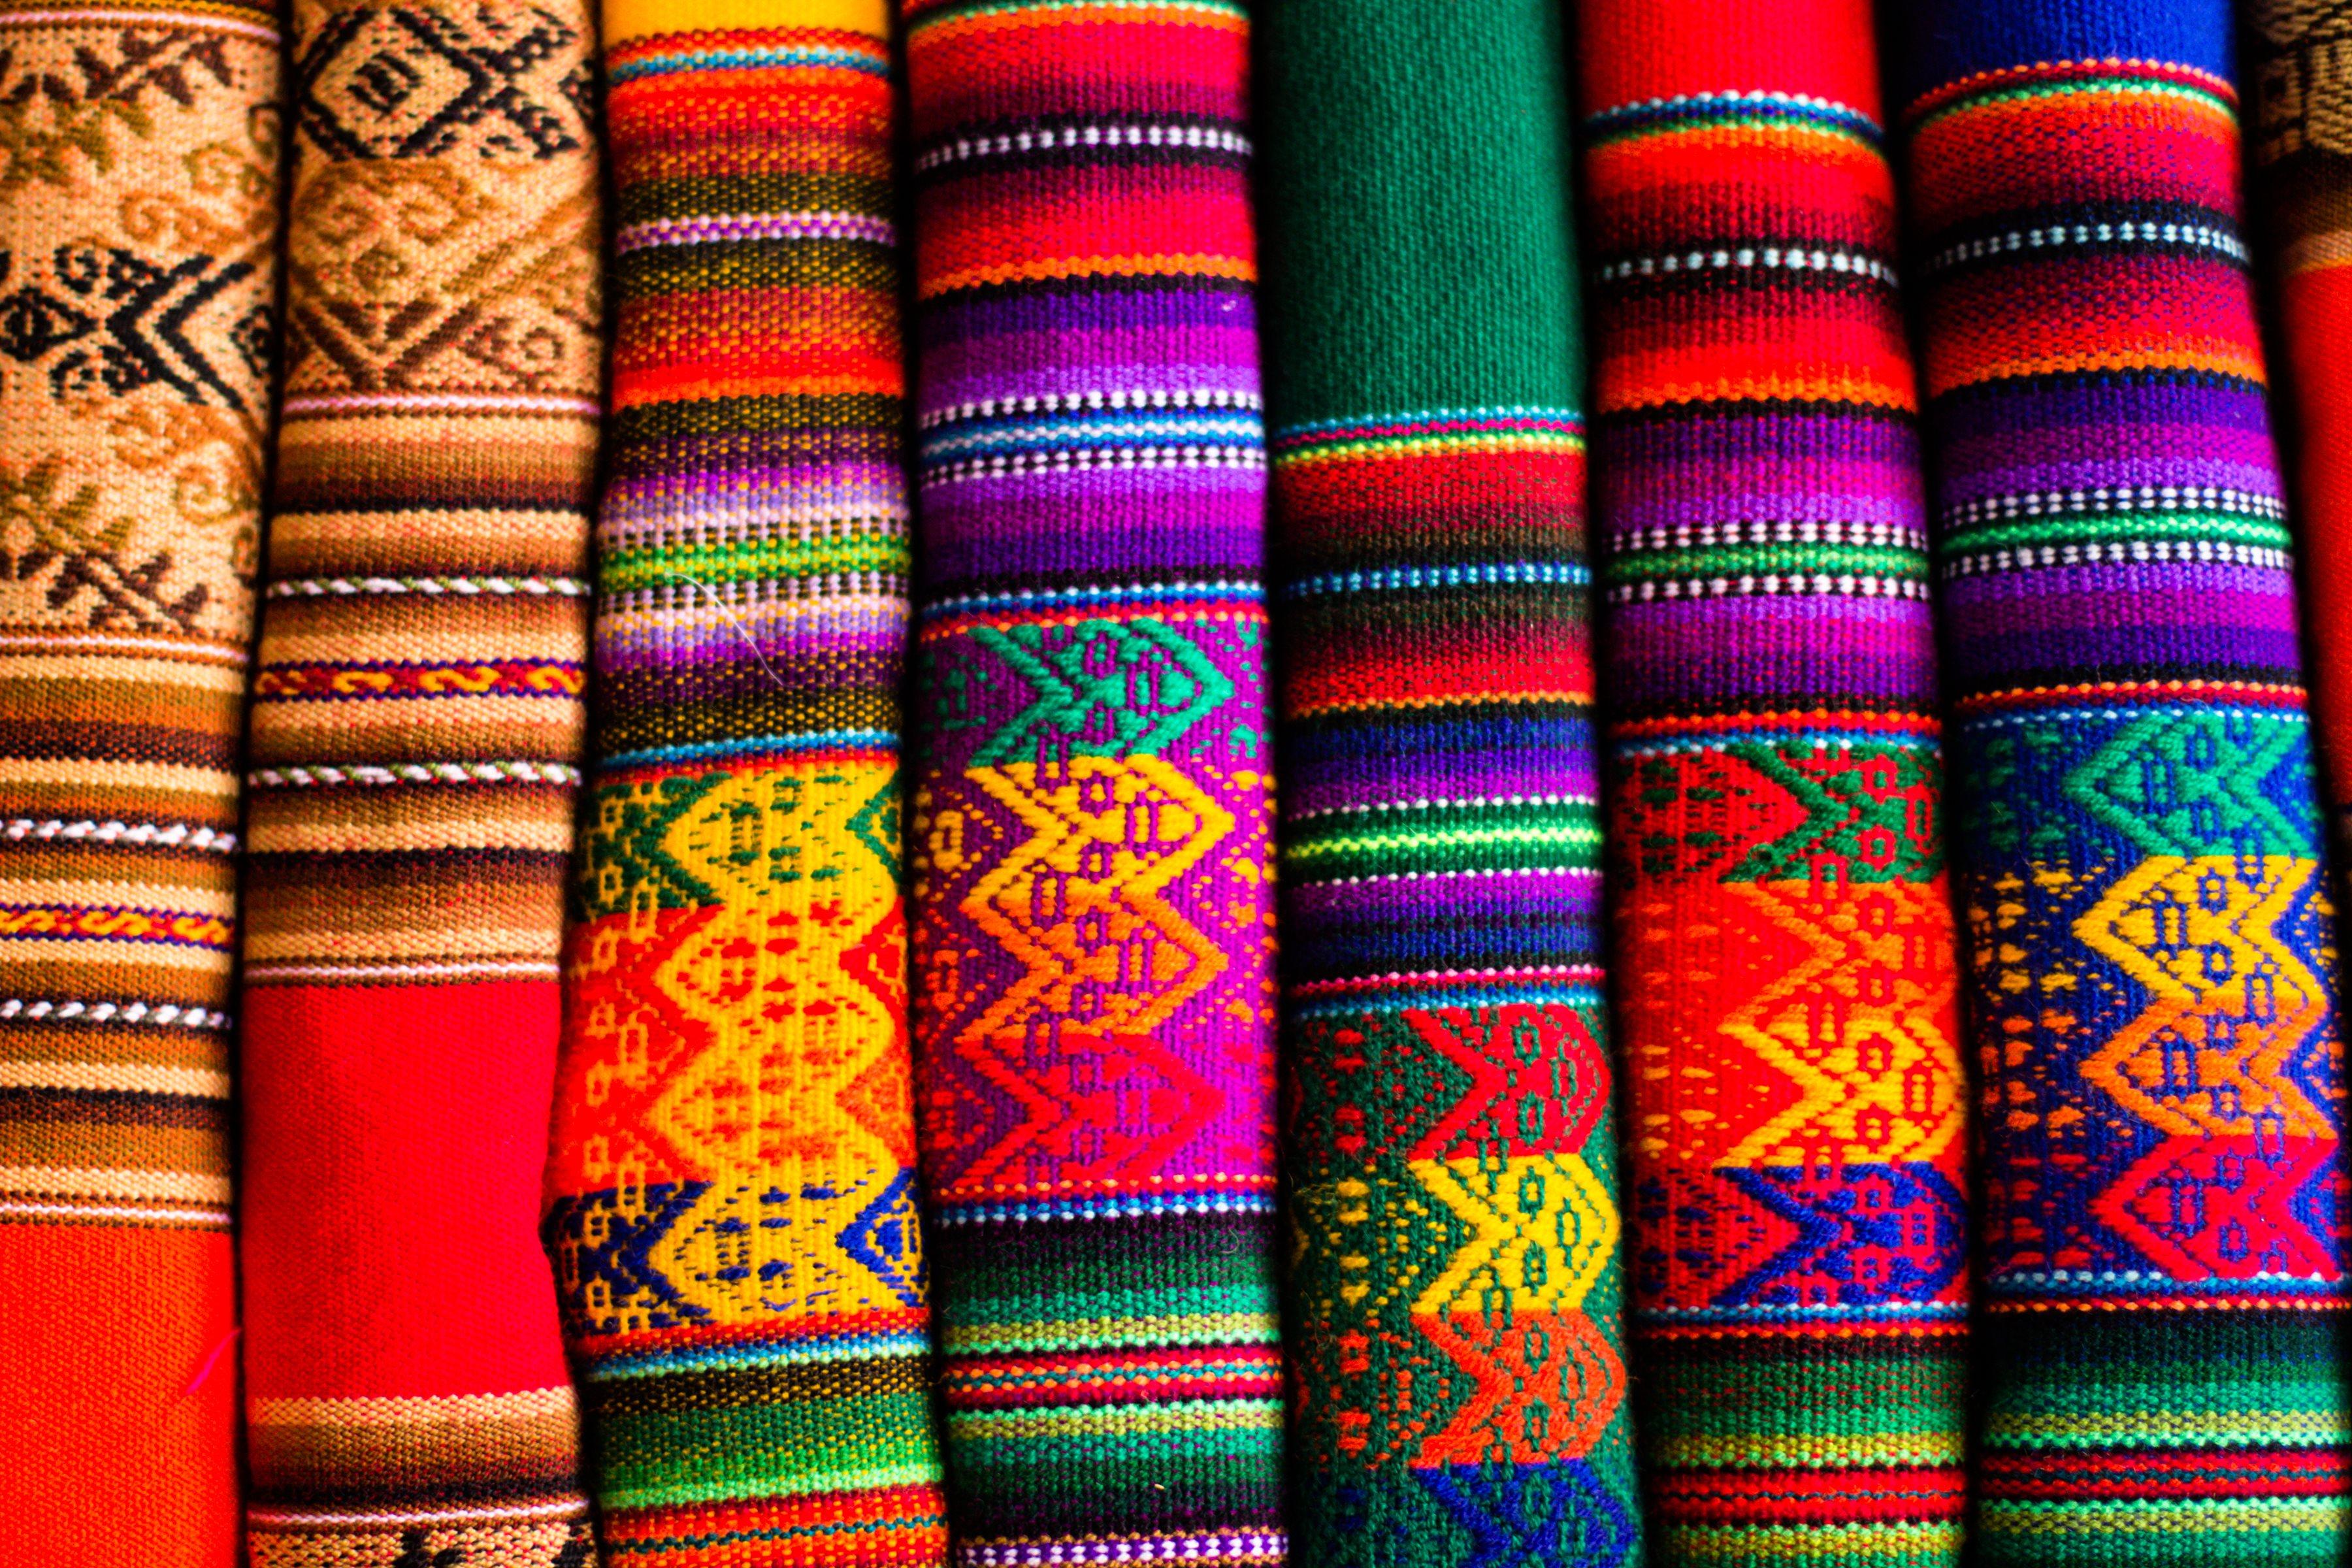 Colorful-Fabric-At-Market-In-Peru-46769575.jpg